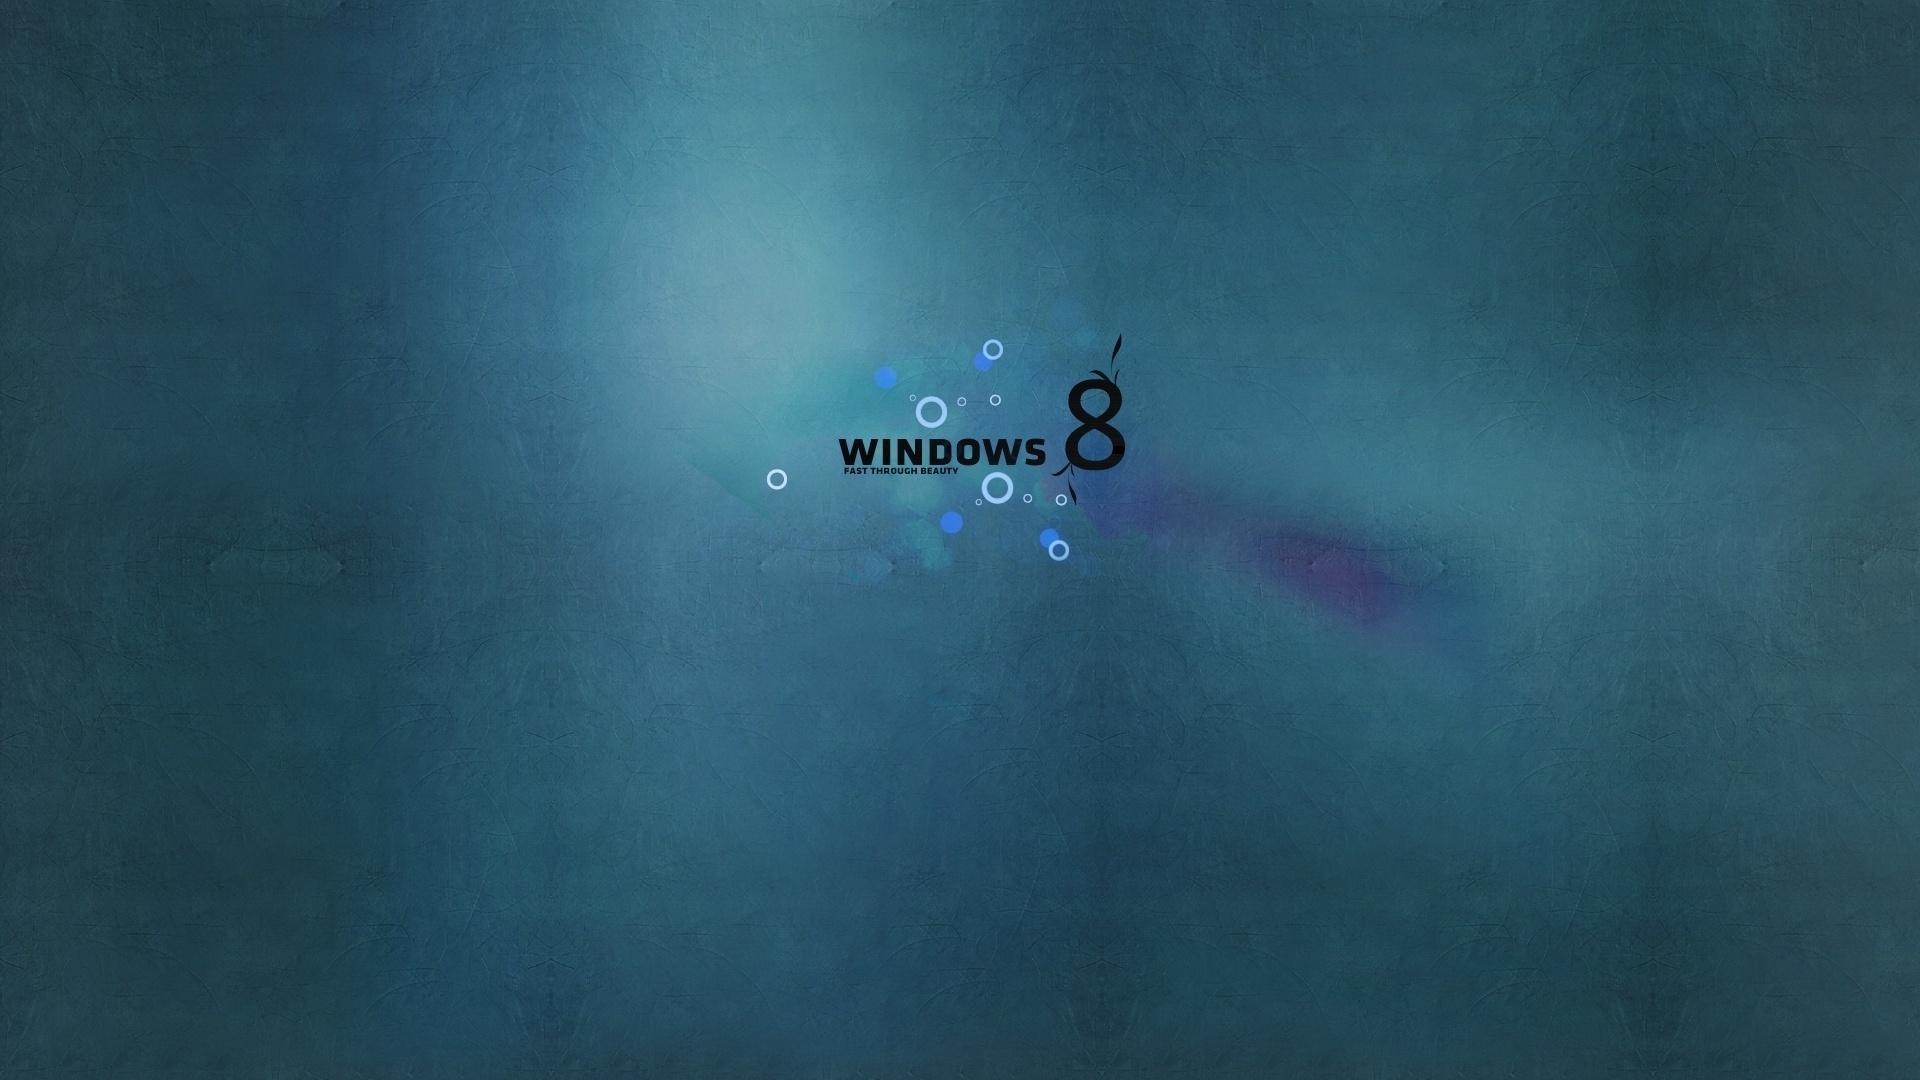 windows 8 hd wallpaper widescreen - wallpapersafari